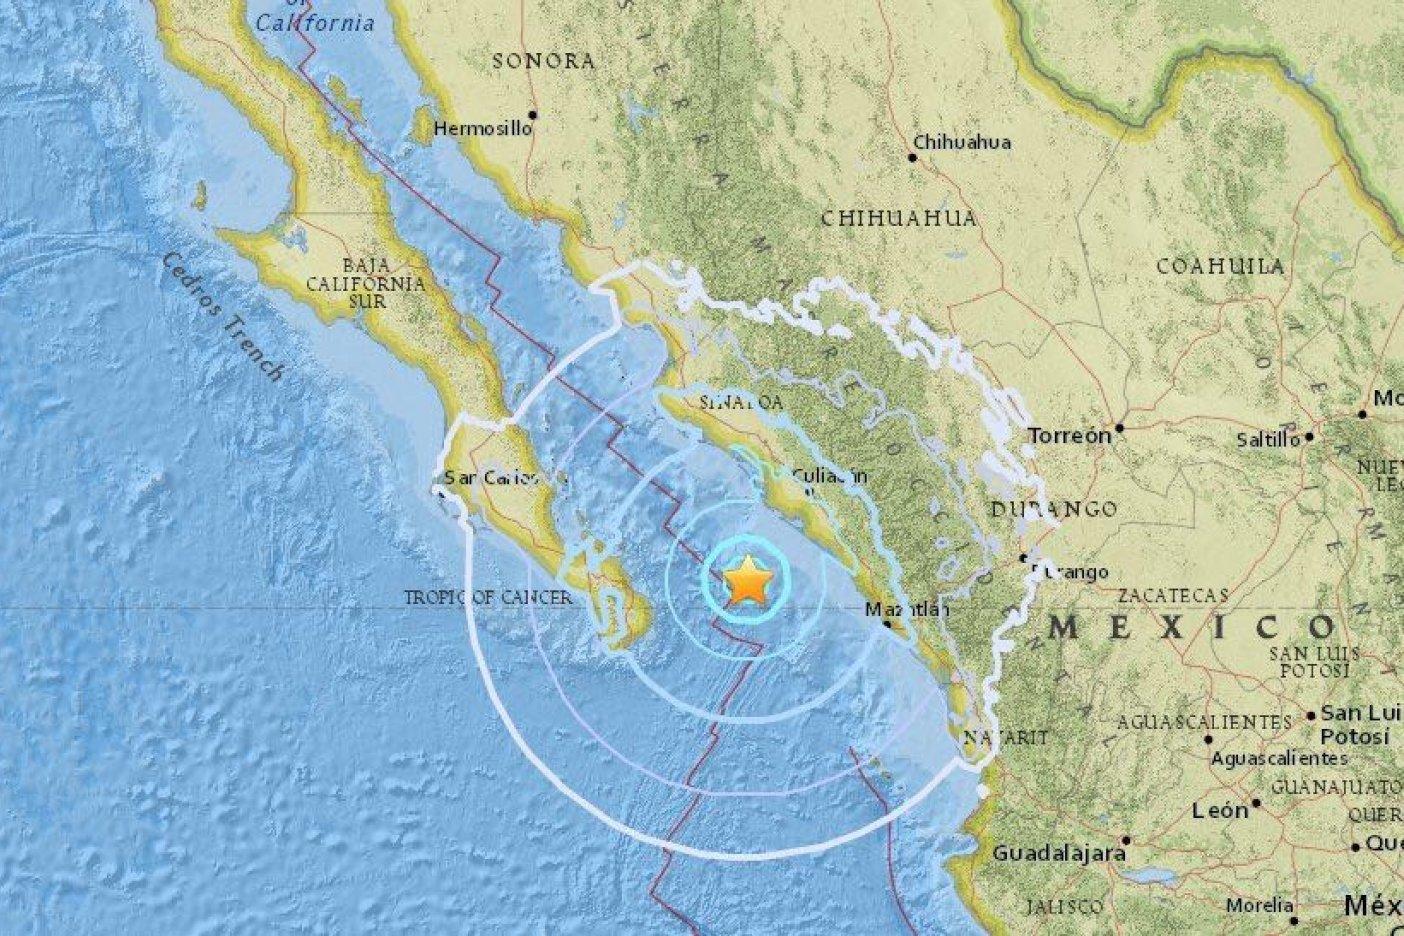 Se registró sismo de 5.1 en Baja California Sur esta madrugada